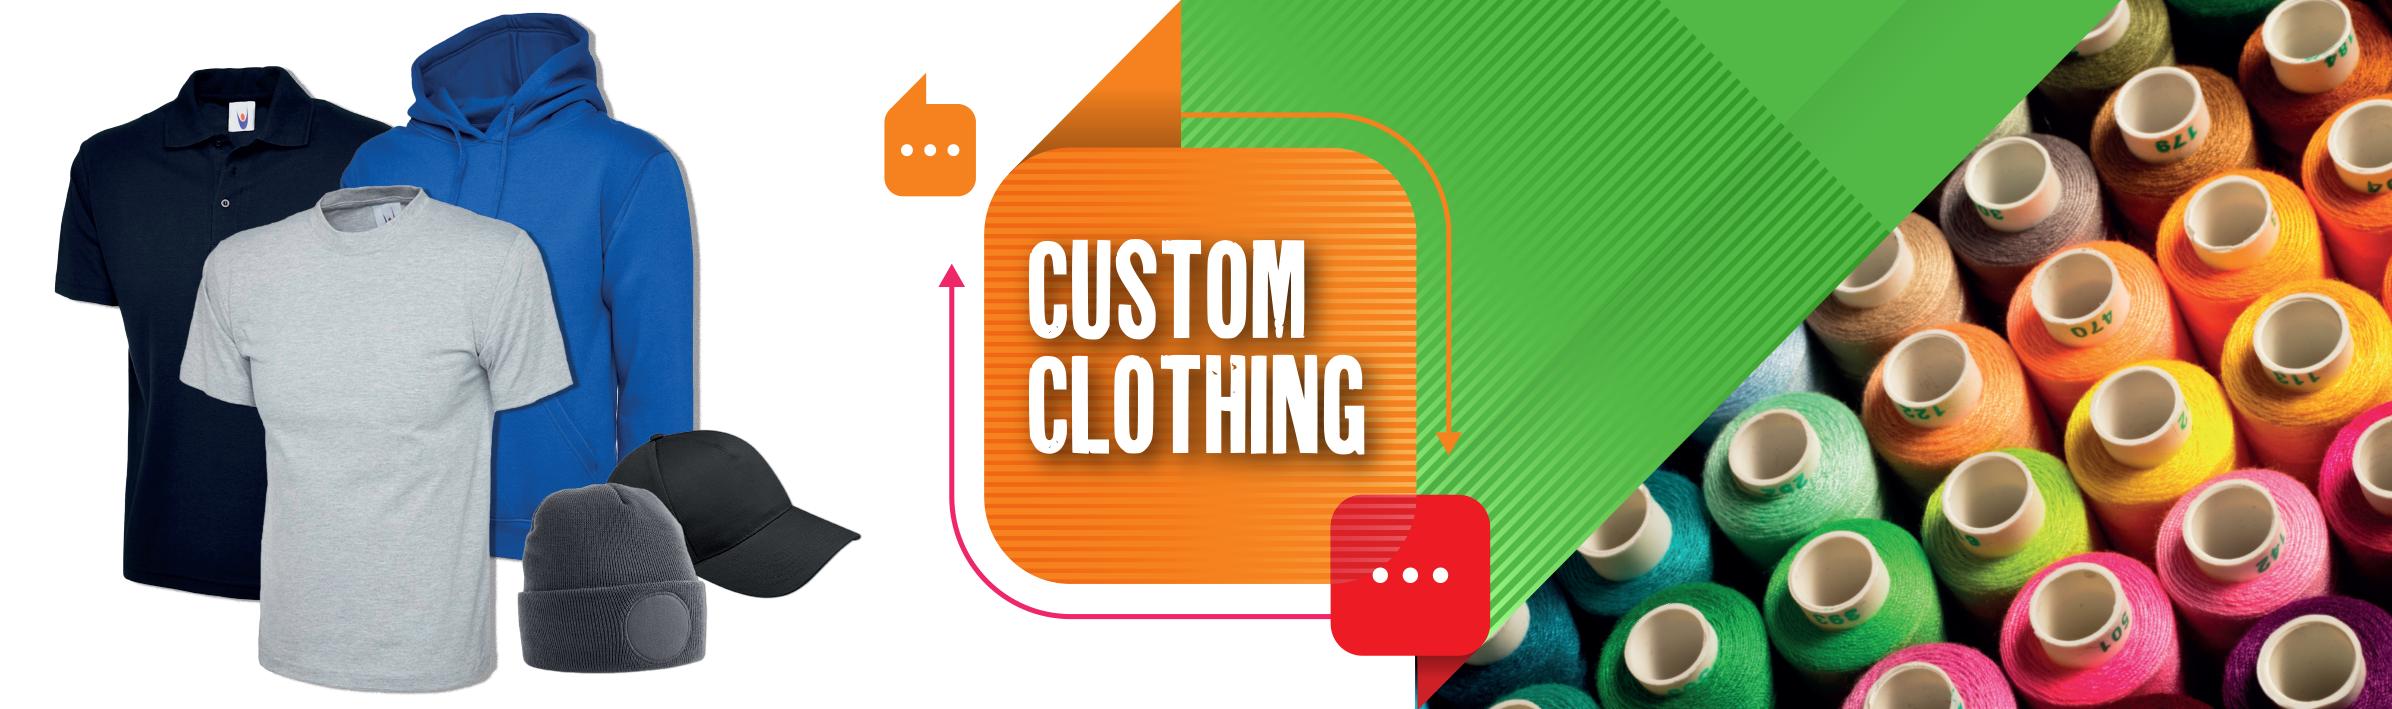 Custom Clothing Product Slider 2021